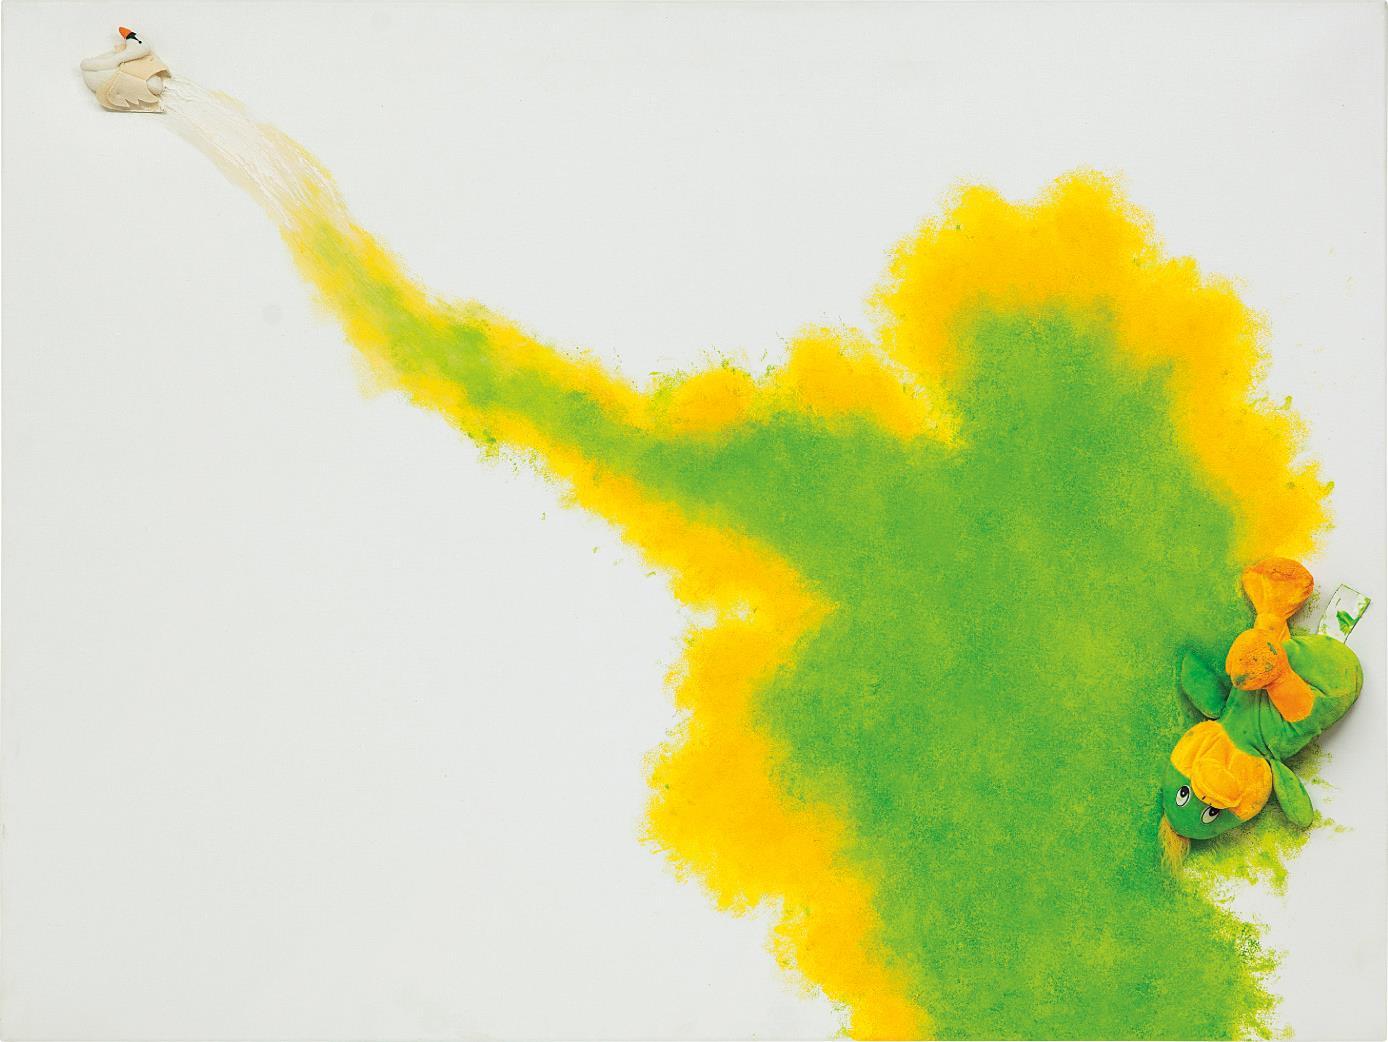 Rostan Tavasiev-Ugly Duckling-2012